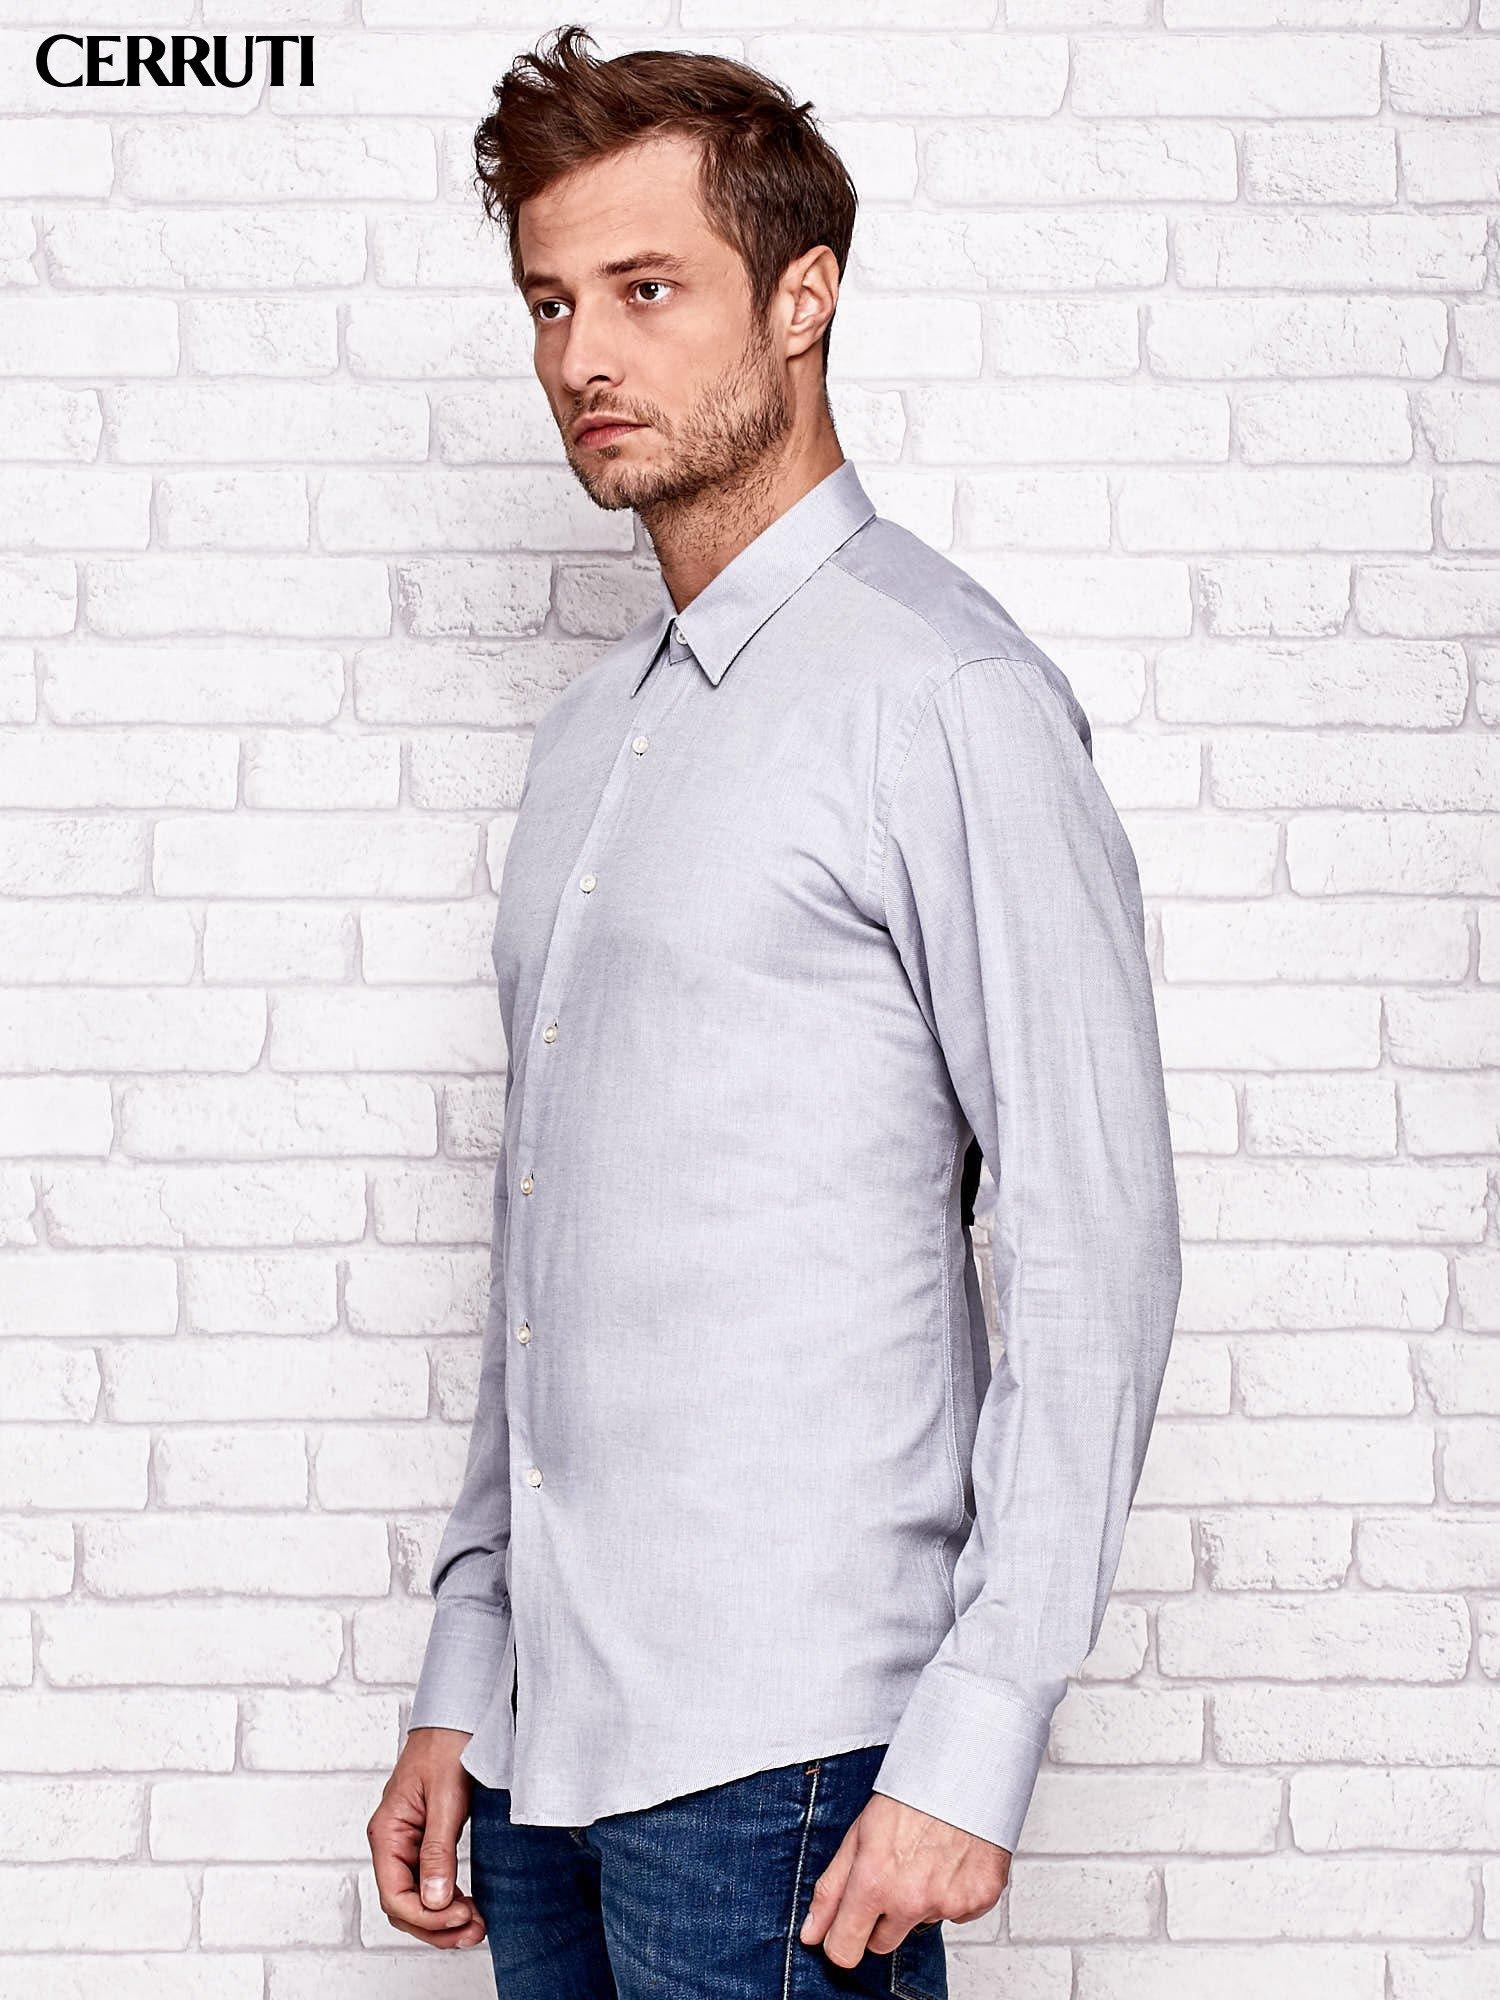 ff6914e45b948 CERRUTI Jasnoszara koszula męska - Mężczyźni koszula męska - sklep ...